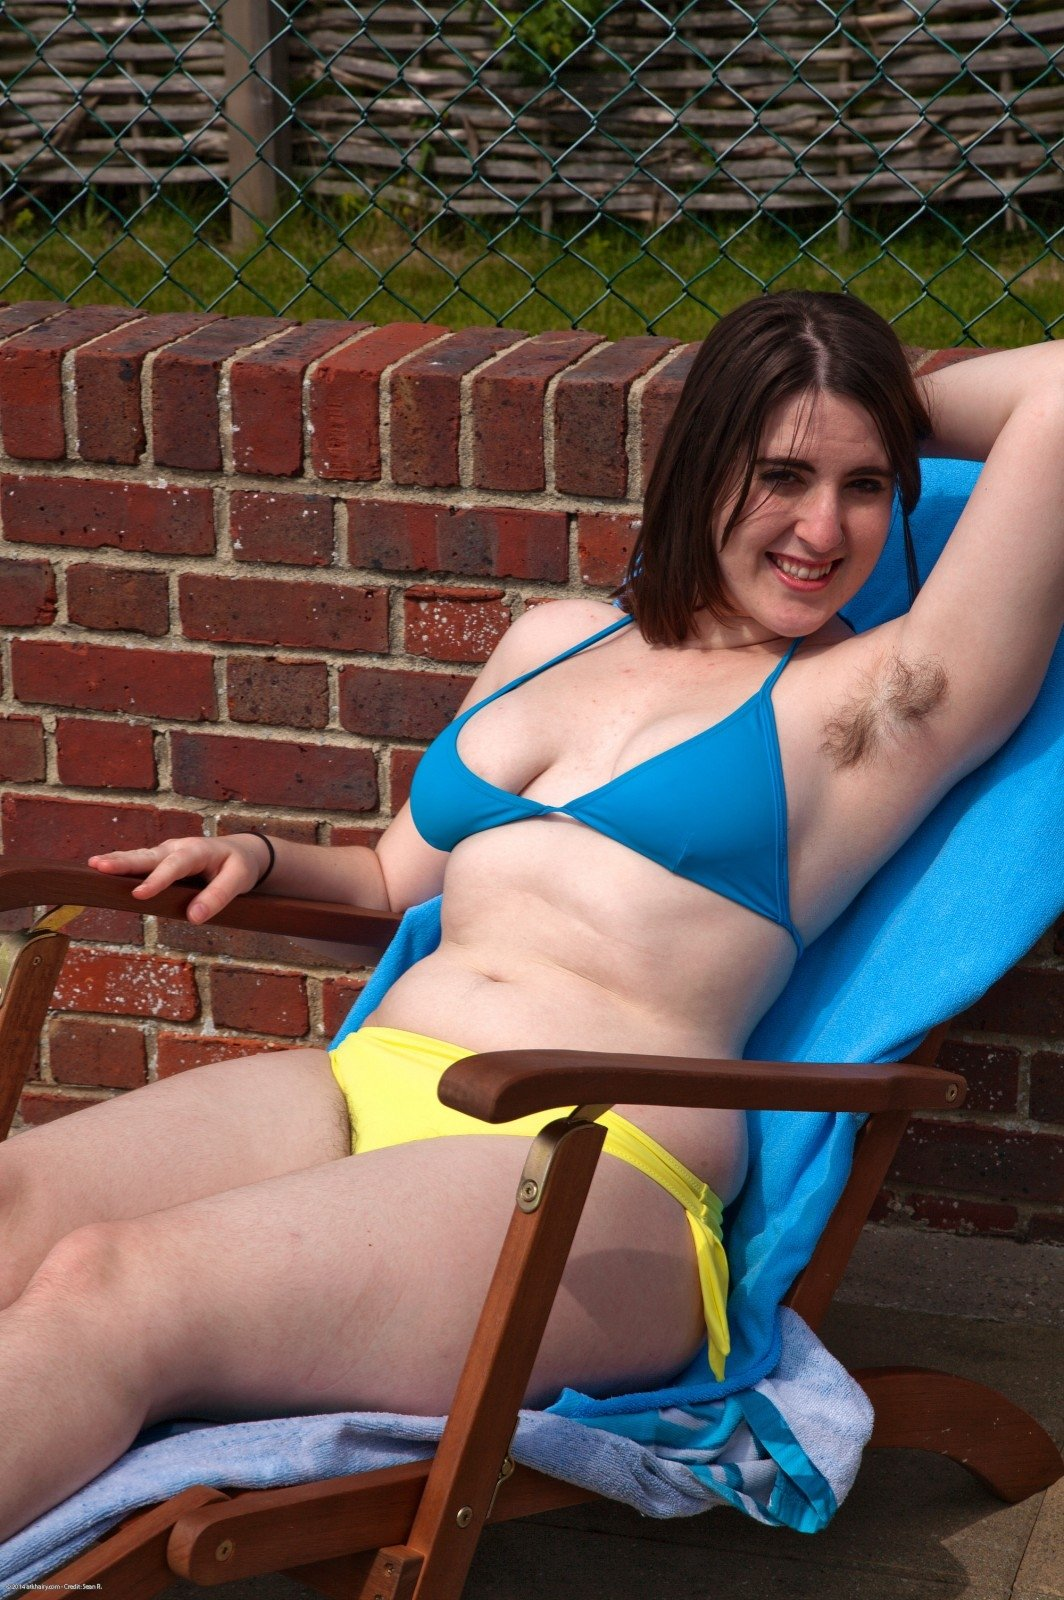 В бассейне - Фото галерея 1054787